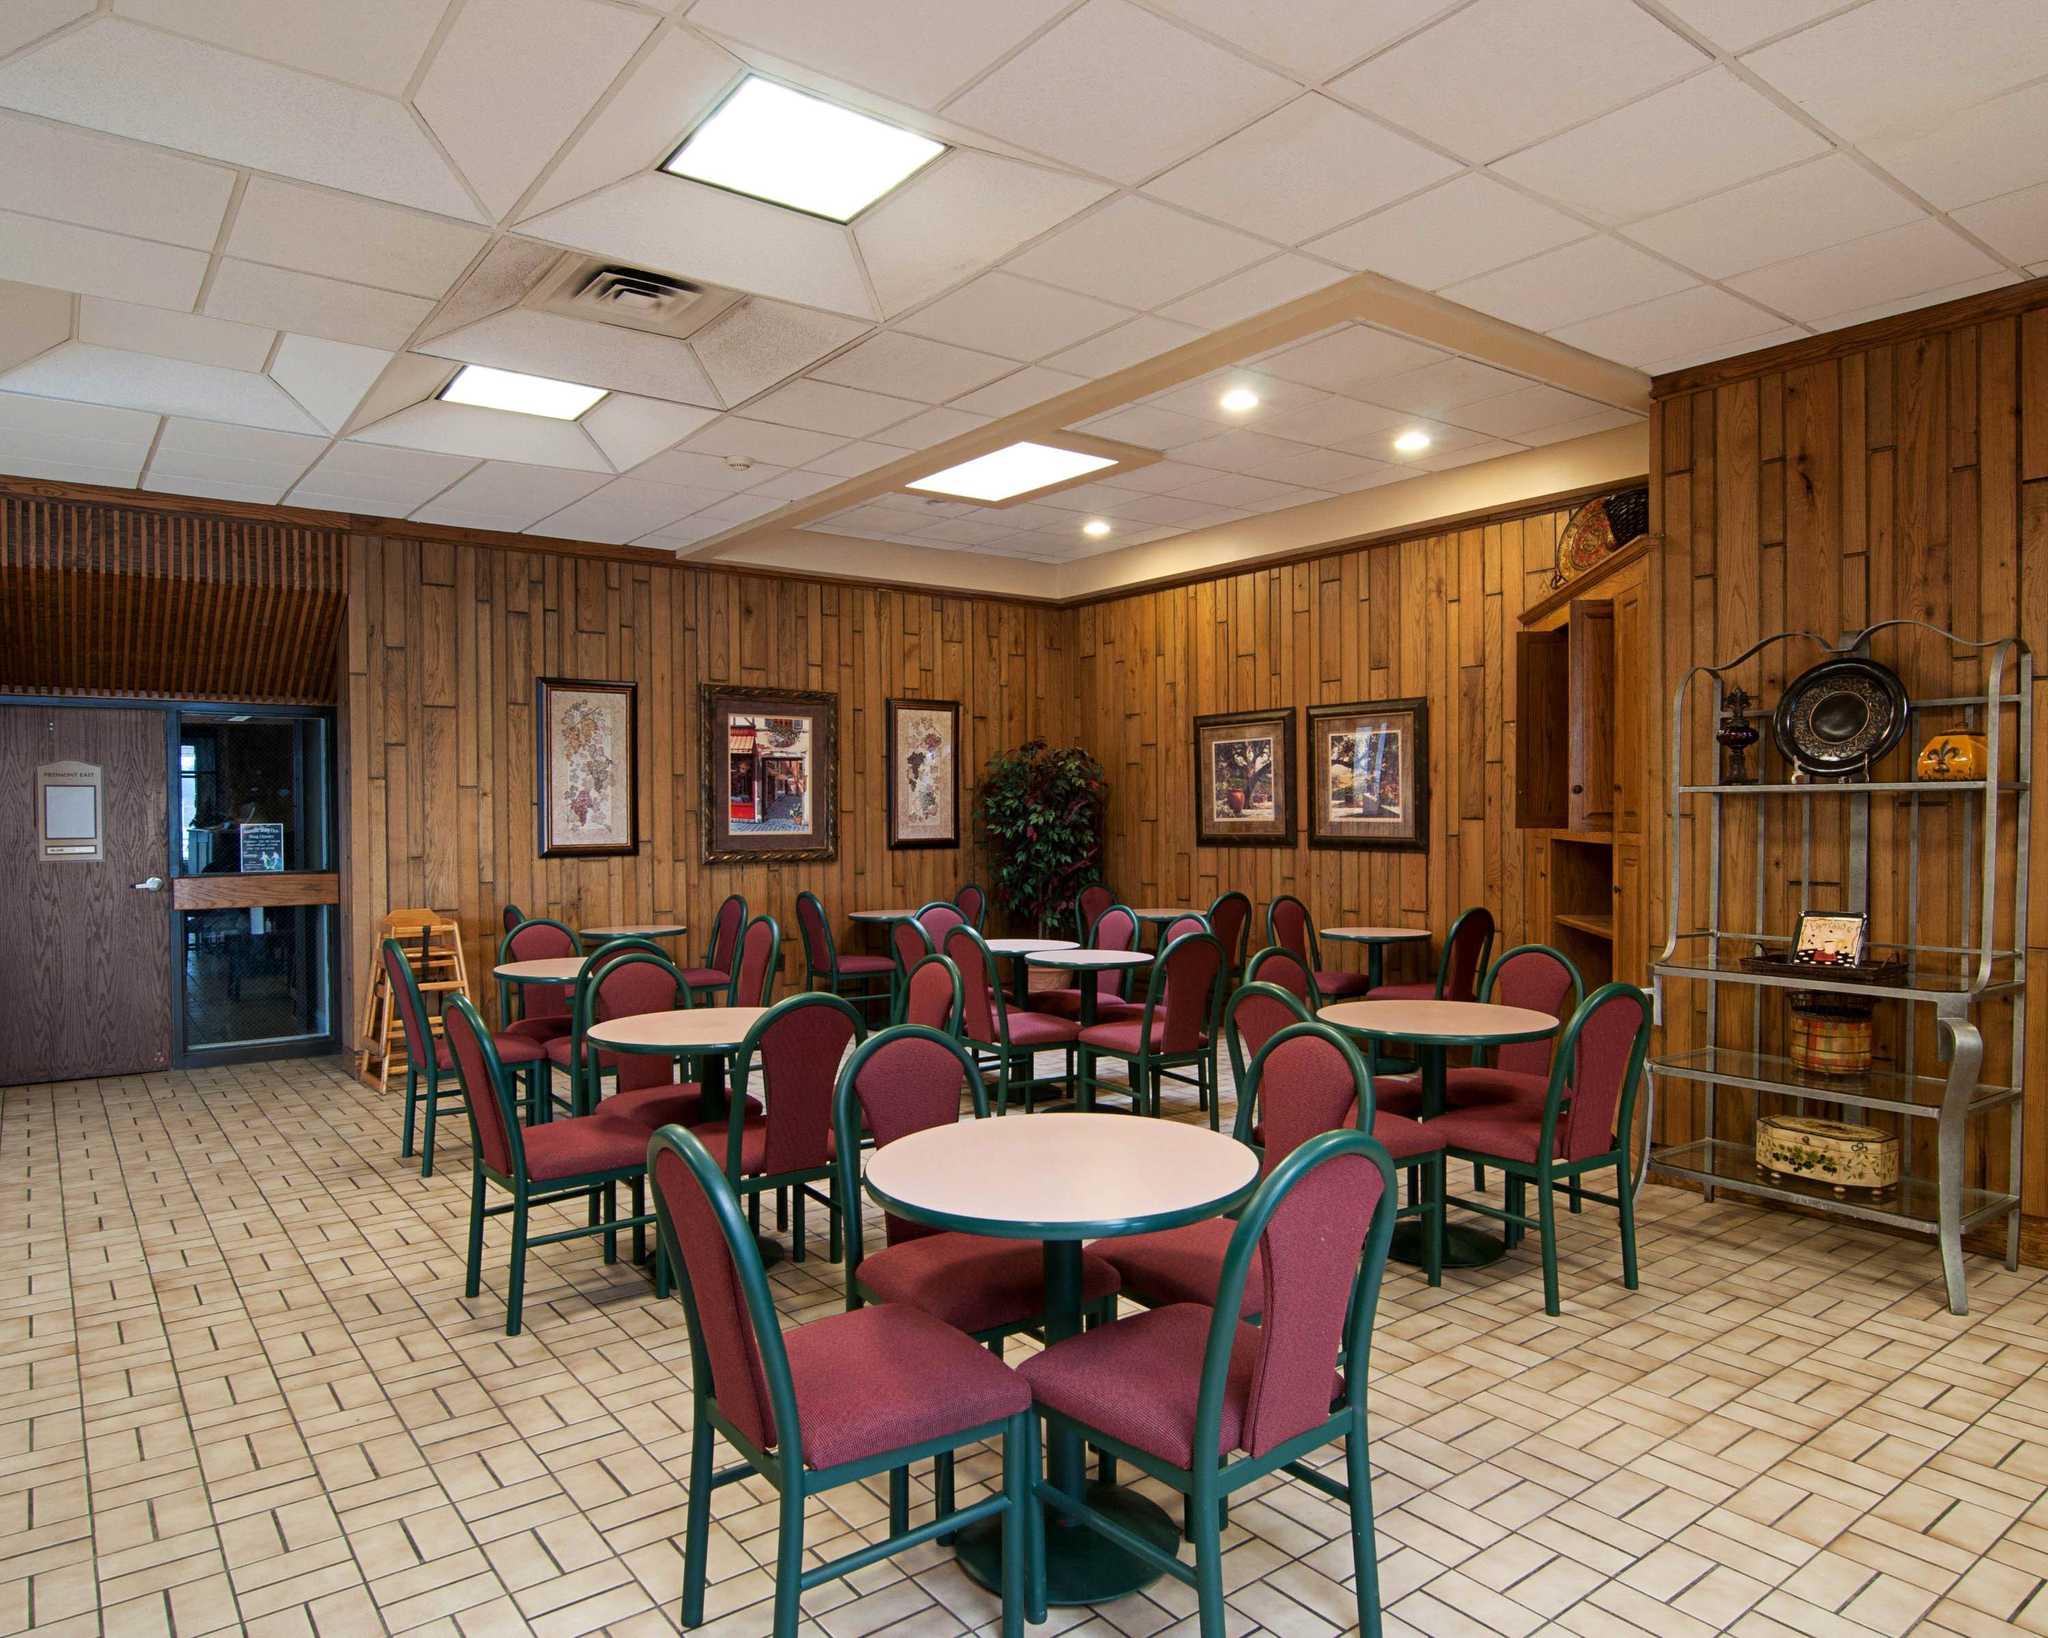 Motorsports Shops Near Me >> Comfort Inn & Suites Coupons Danville VA near me | 8coupons